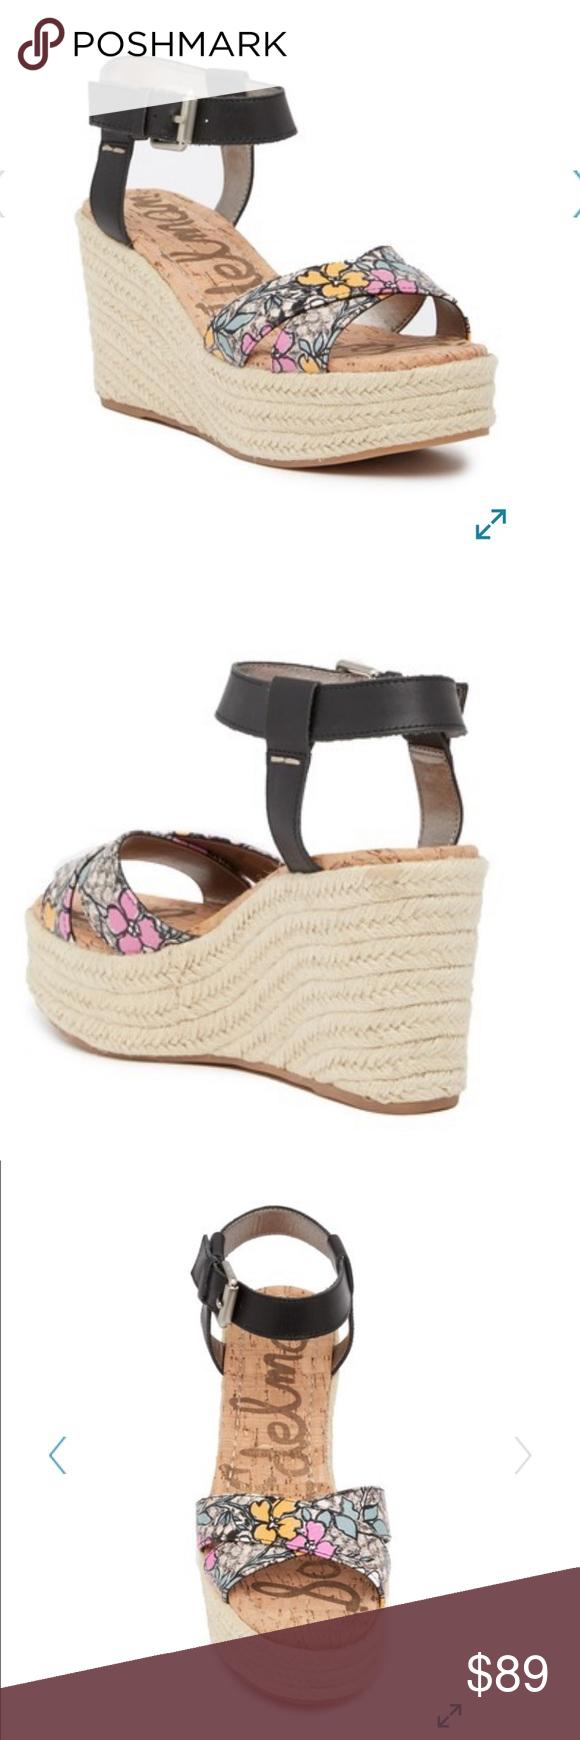 02cbbabcca3a4 Sam Edelman Destin Espadrille Wedge Sandal Sizing  True to size. M standard  width